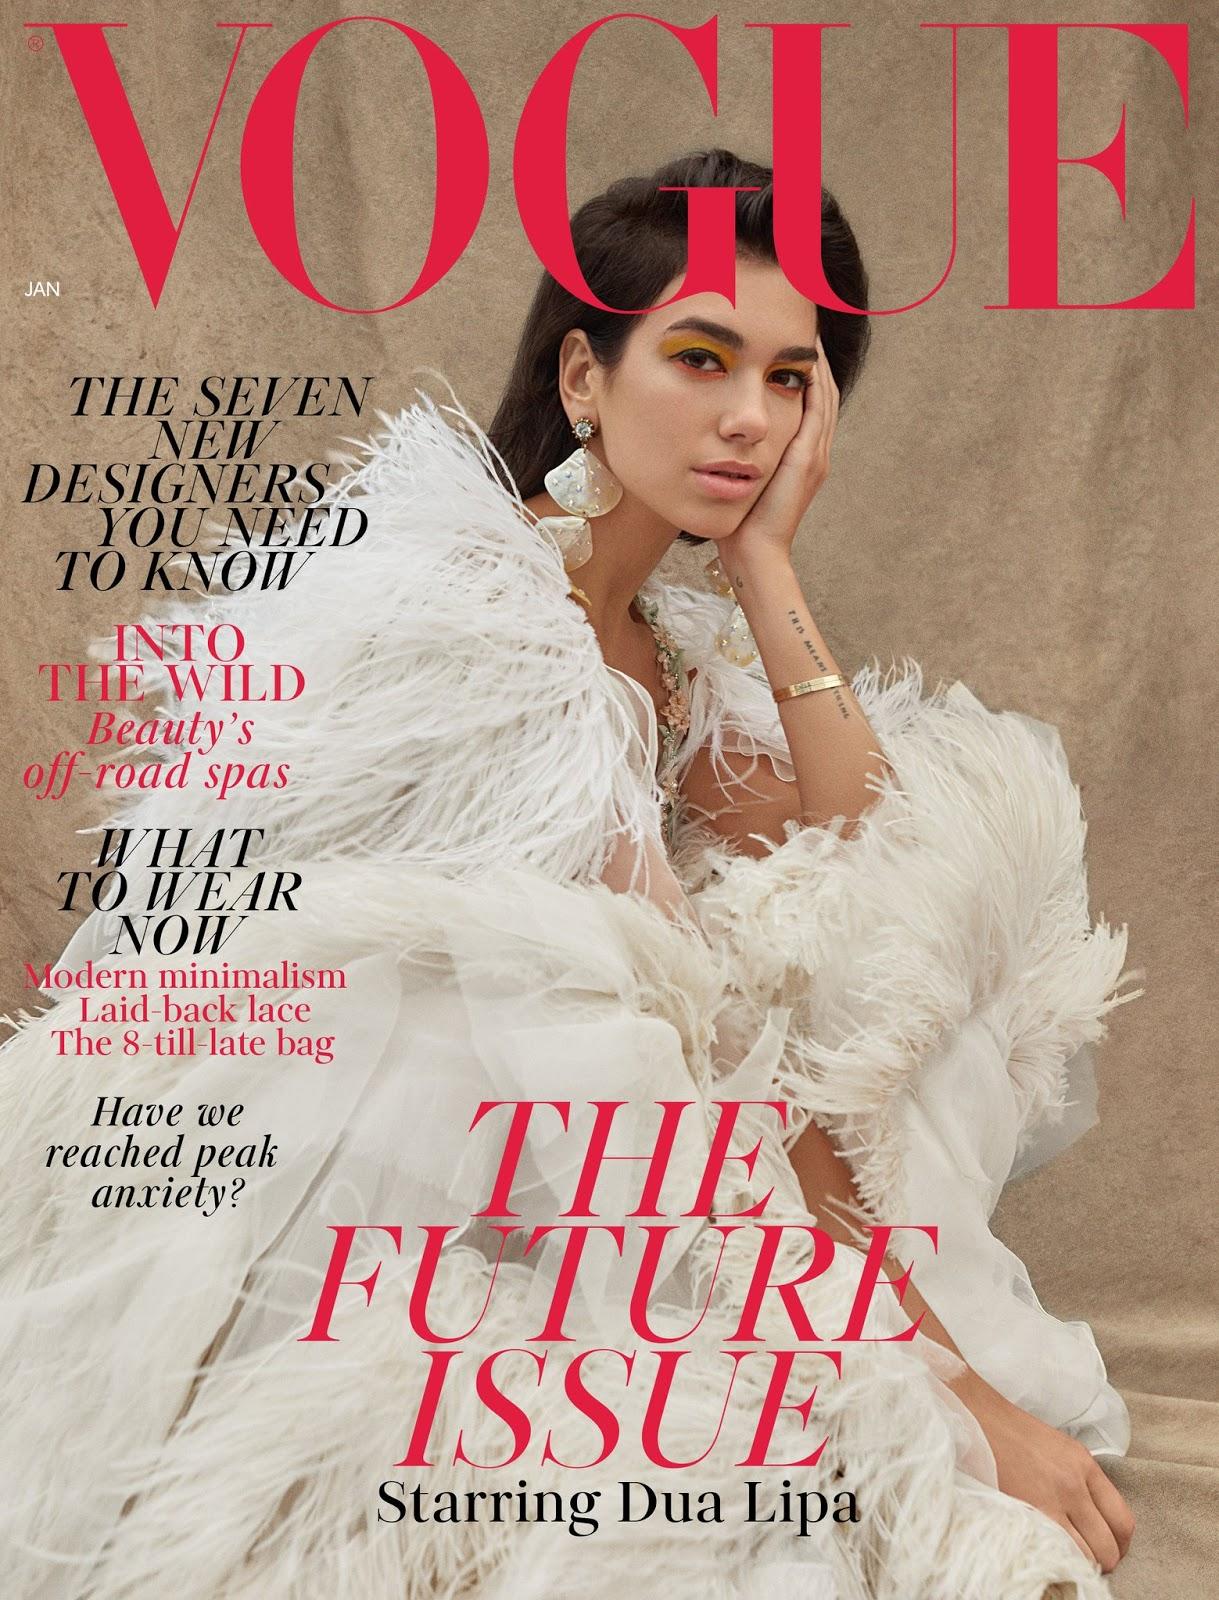 Dua Lipa for Vogue UK January 2019